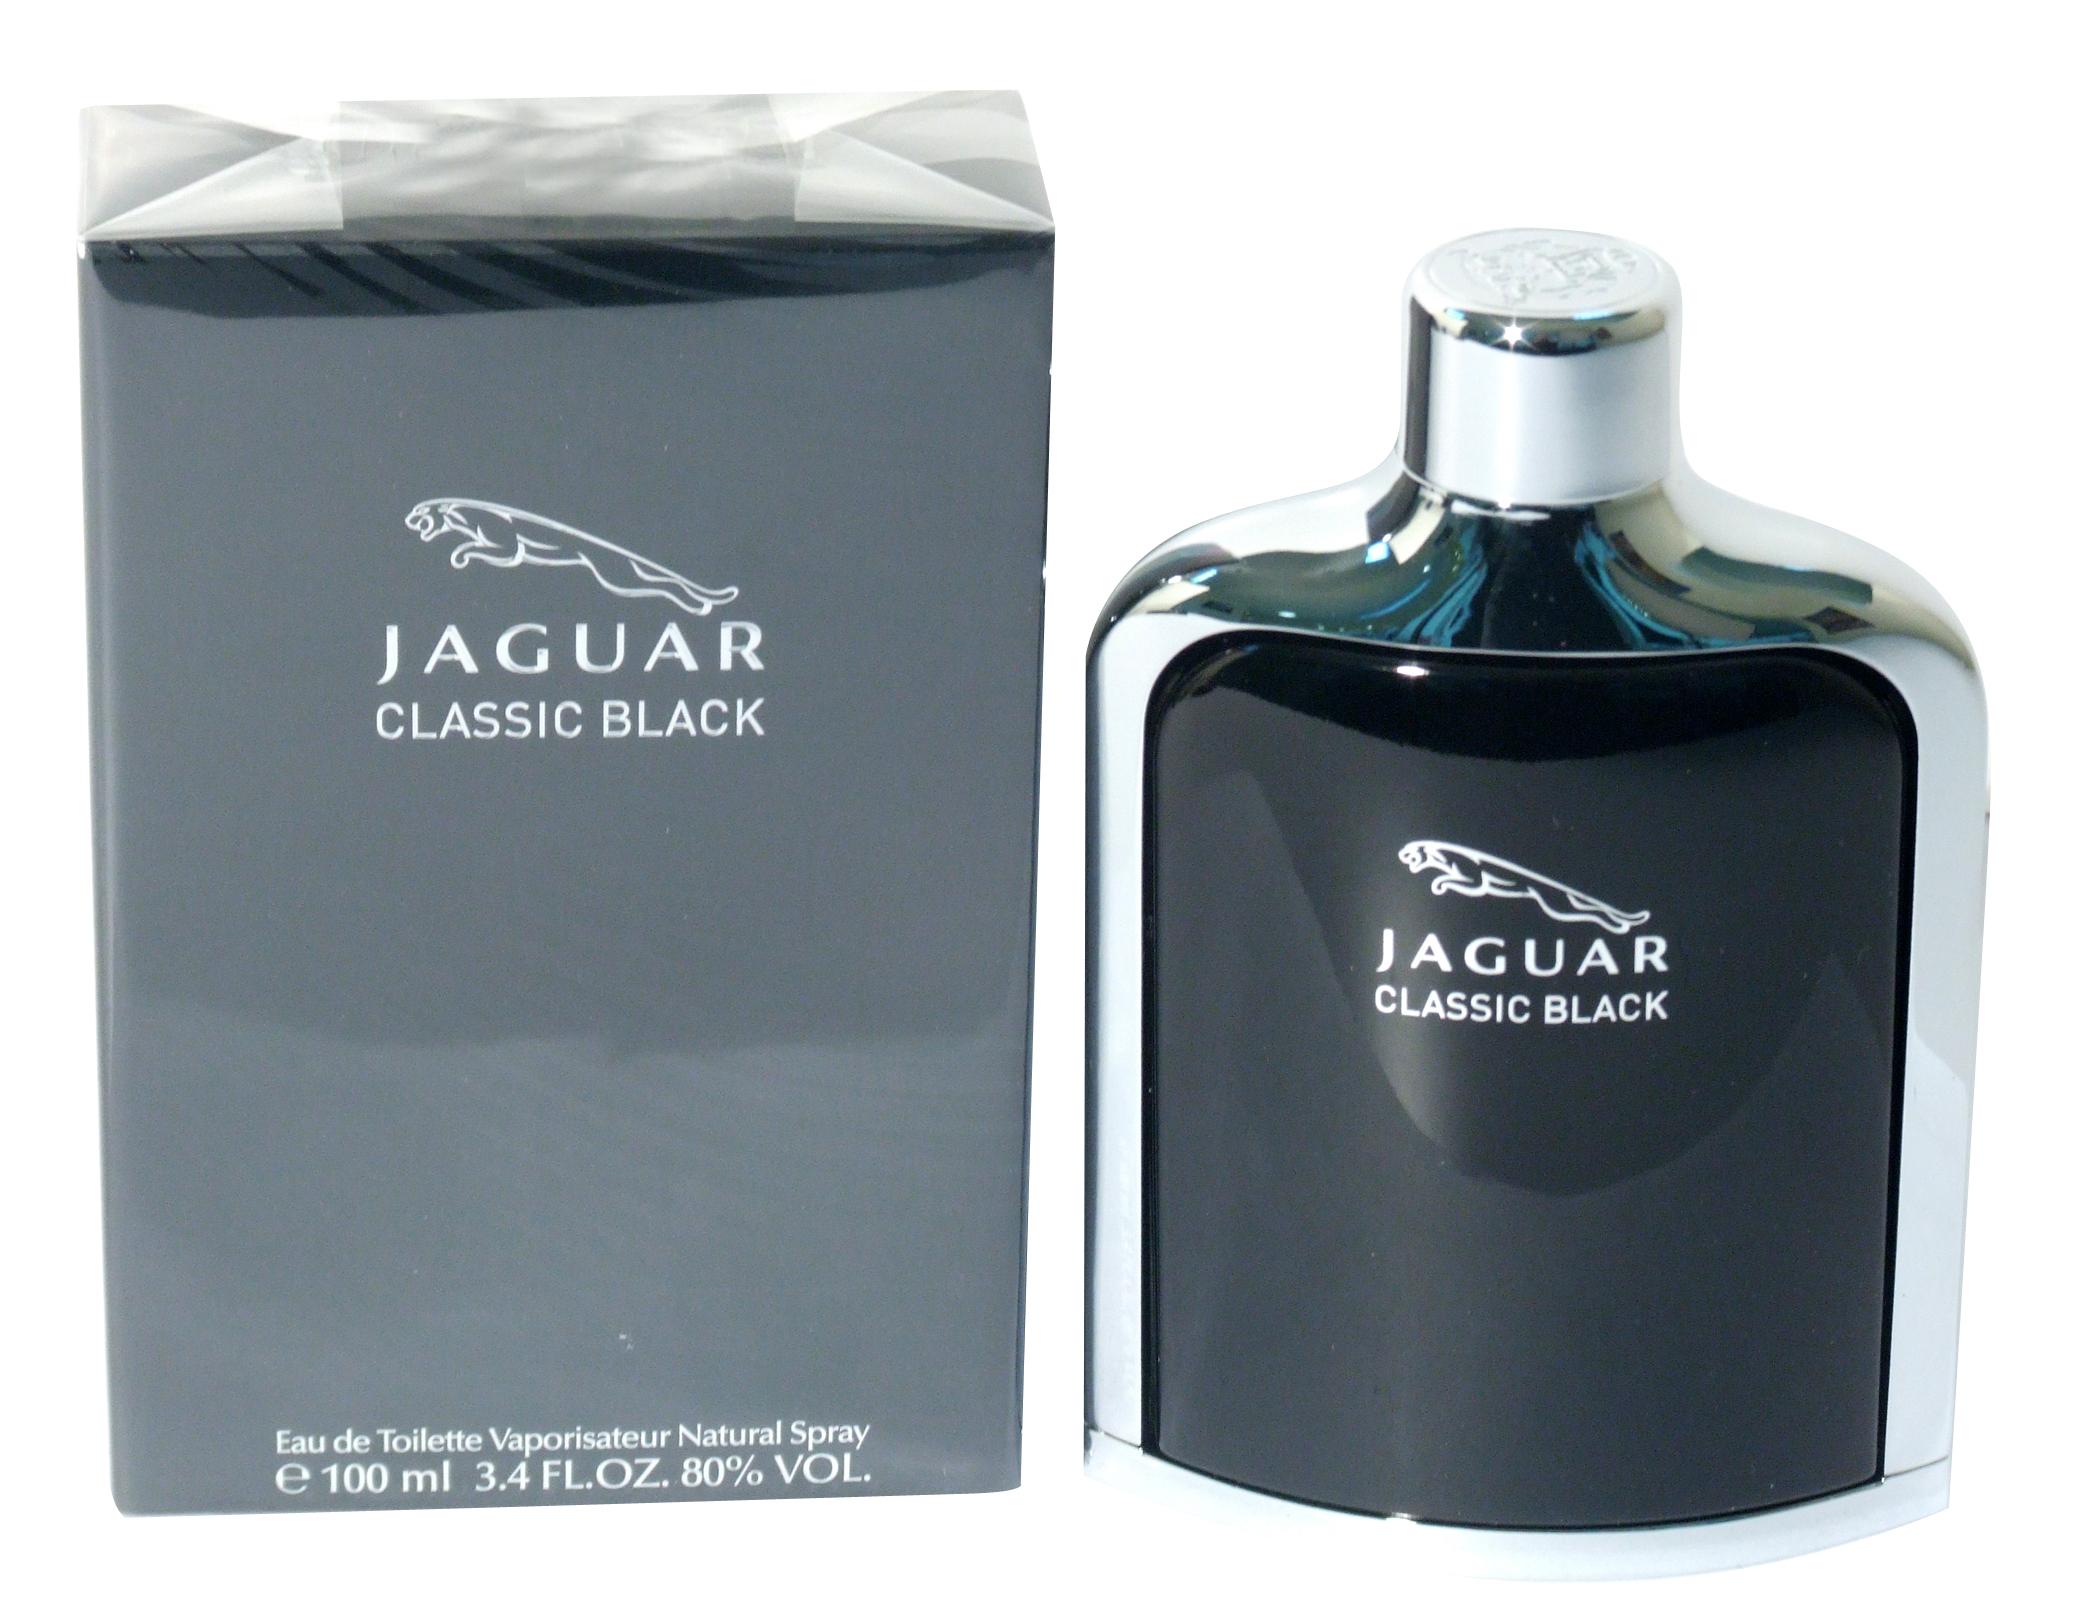 JAGUAR CLASSIC BLACK, 100 ML, א.ד.ט